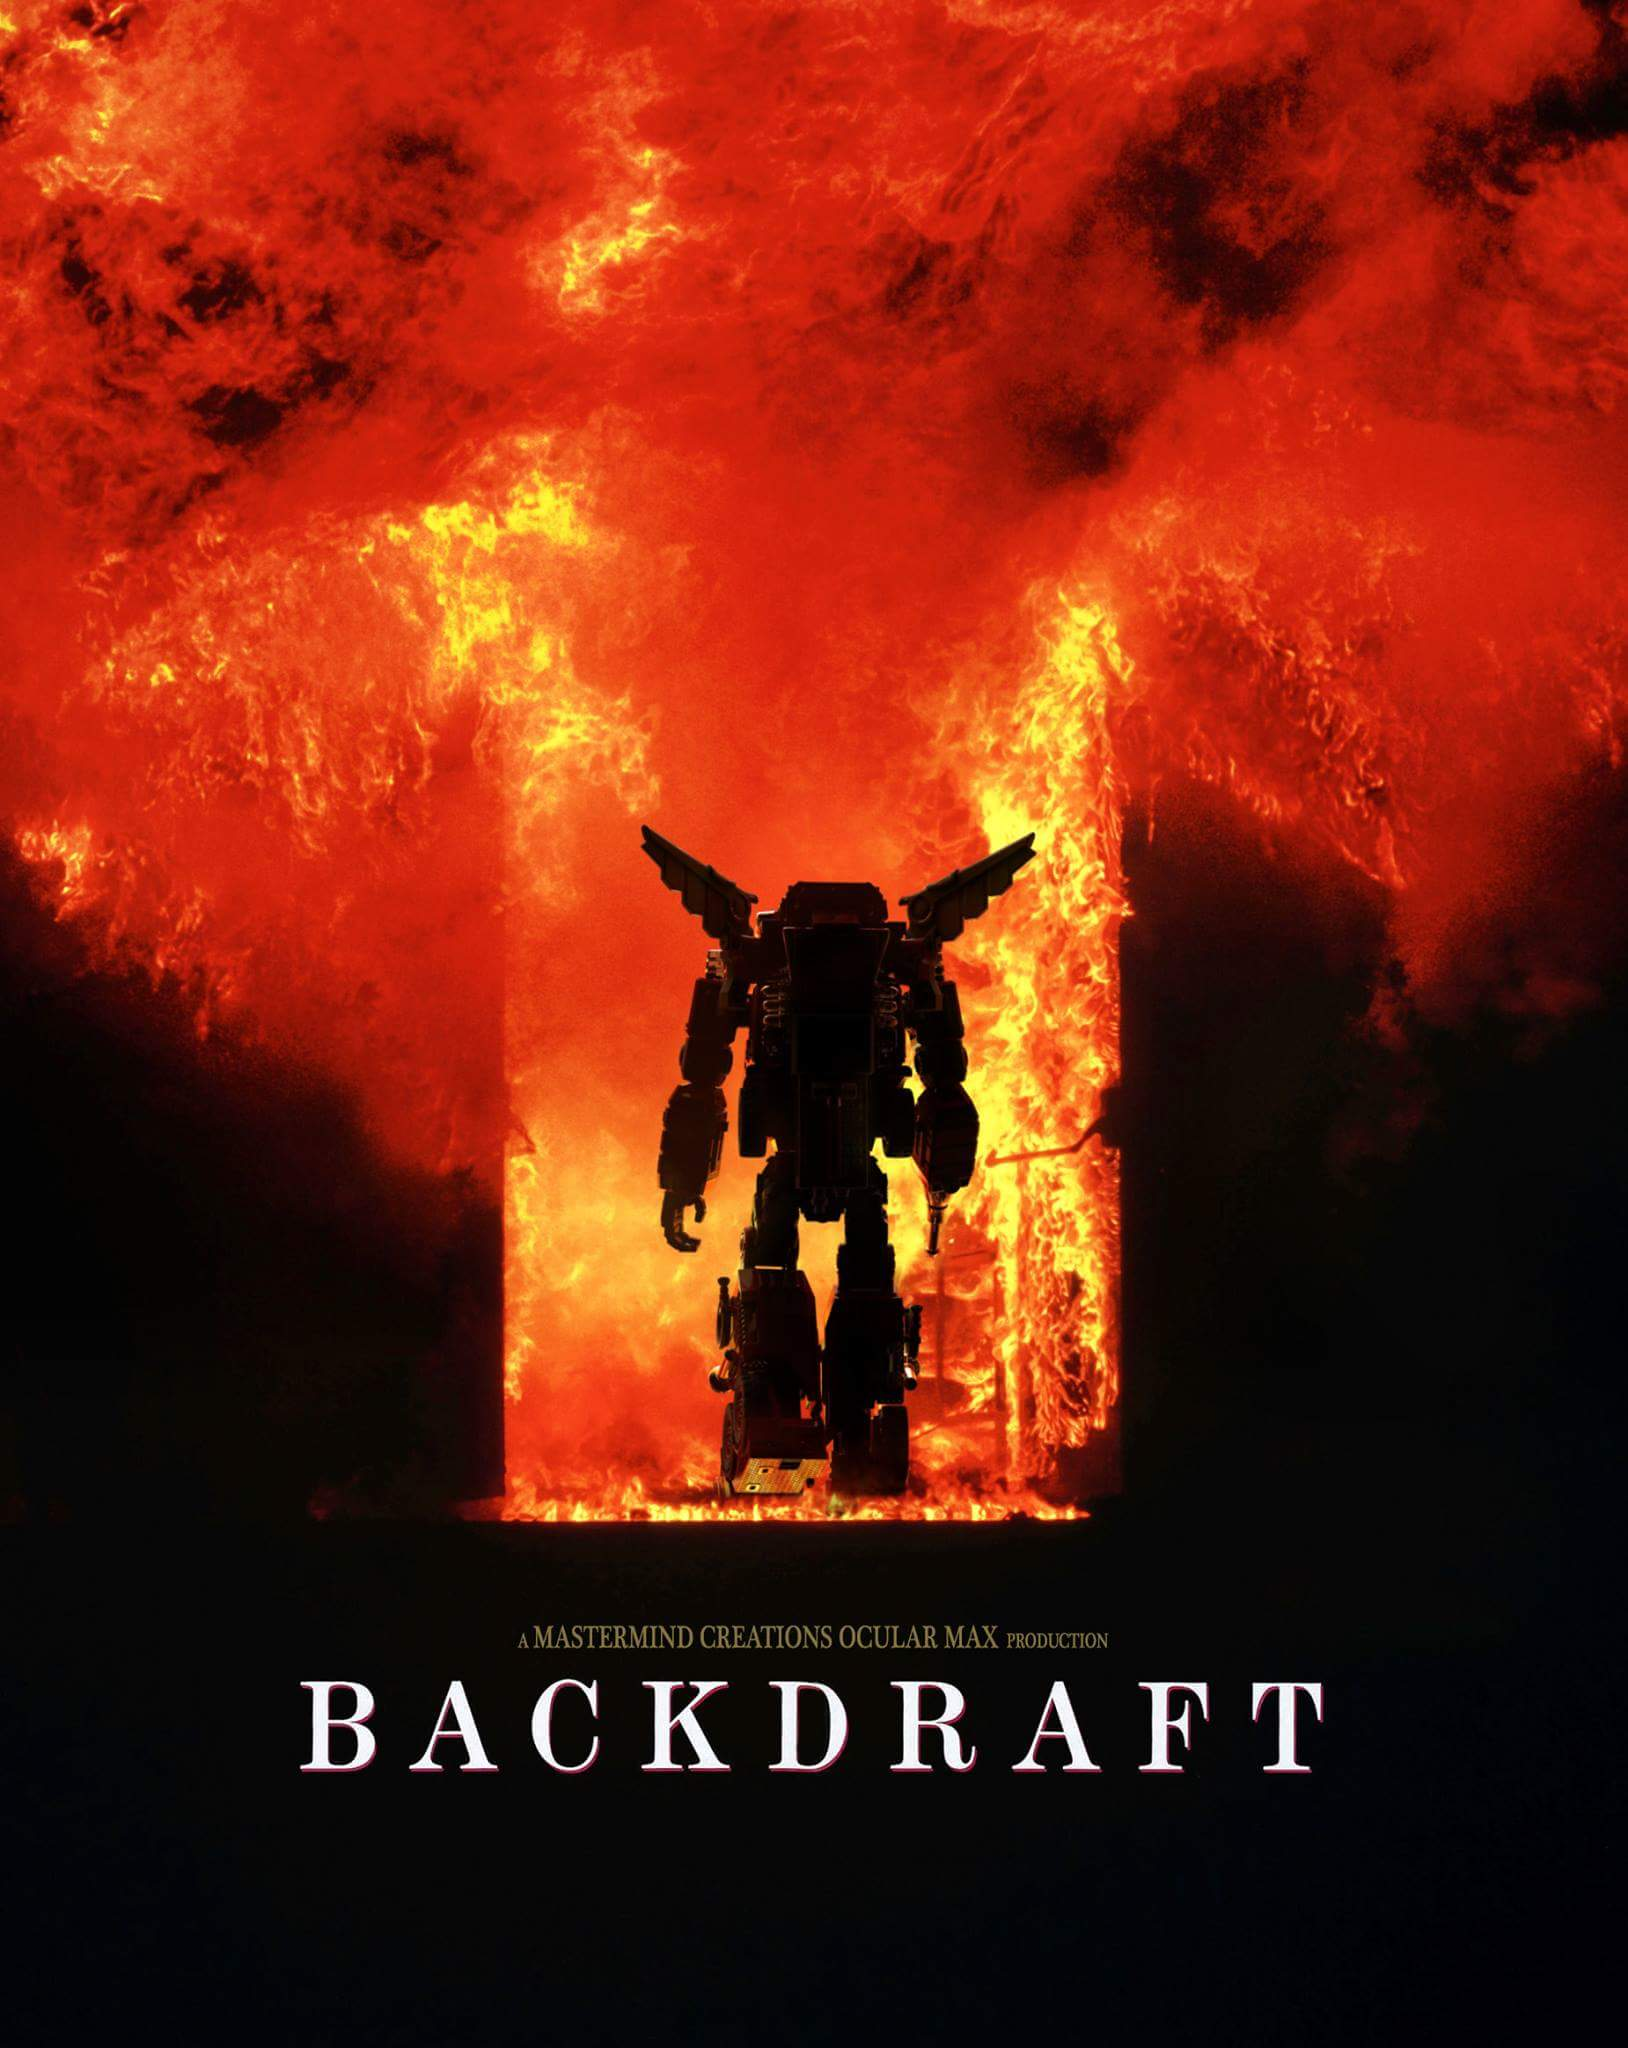 [Ocular Max] Produit Tiers - Jouet PS-03 Backdraft (aka Inferno) + PS-08 Kojin (aka Artfire) DNK3XBZr